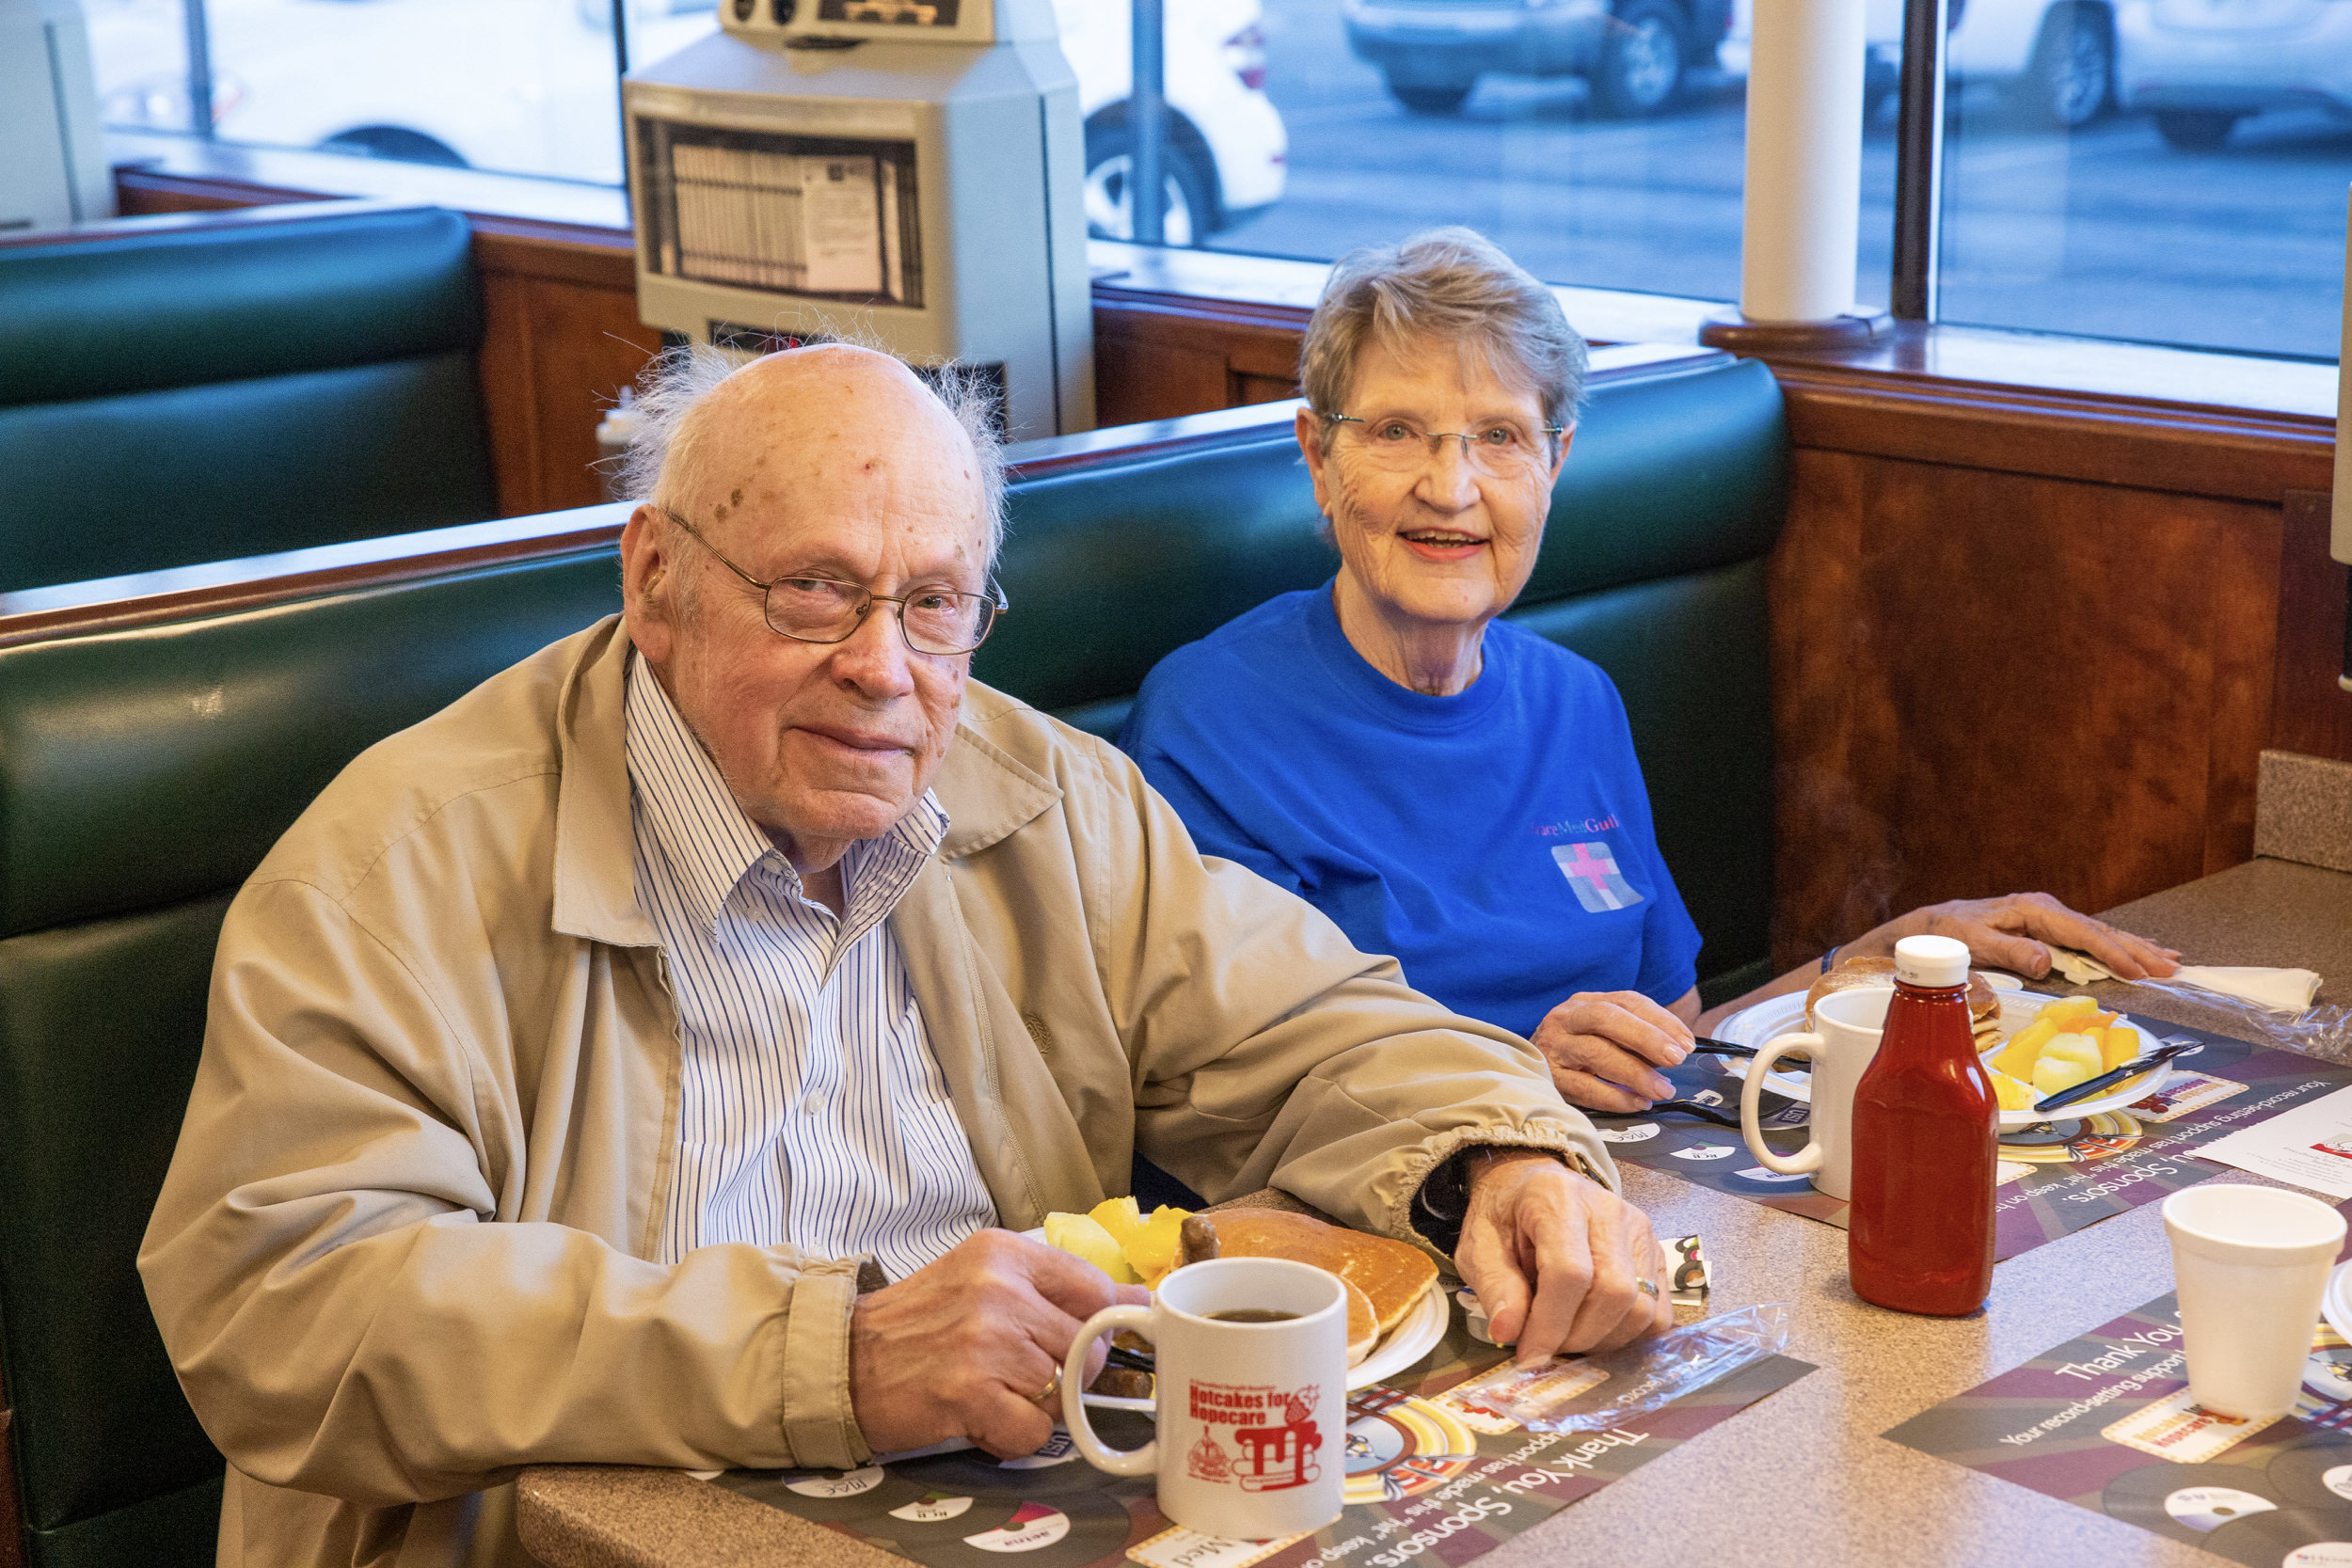 Bob and Sue McAllister